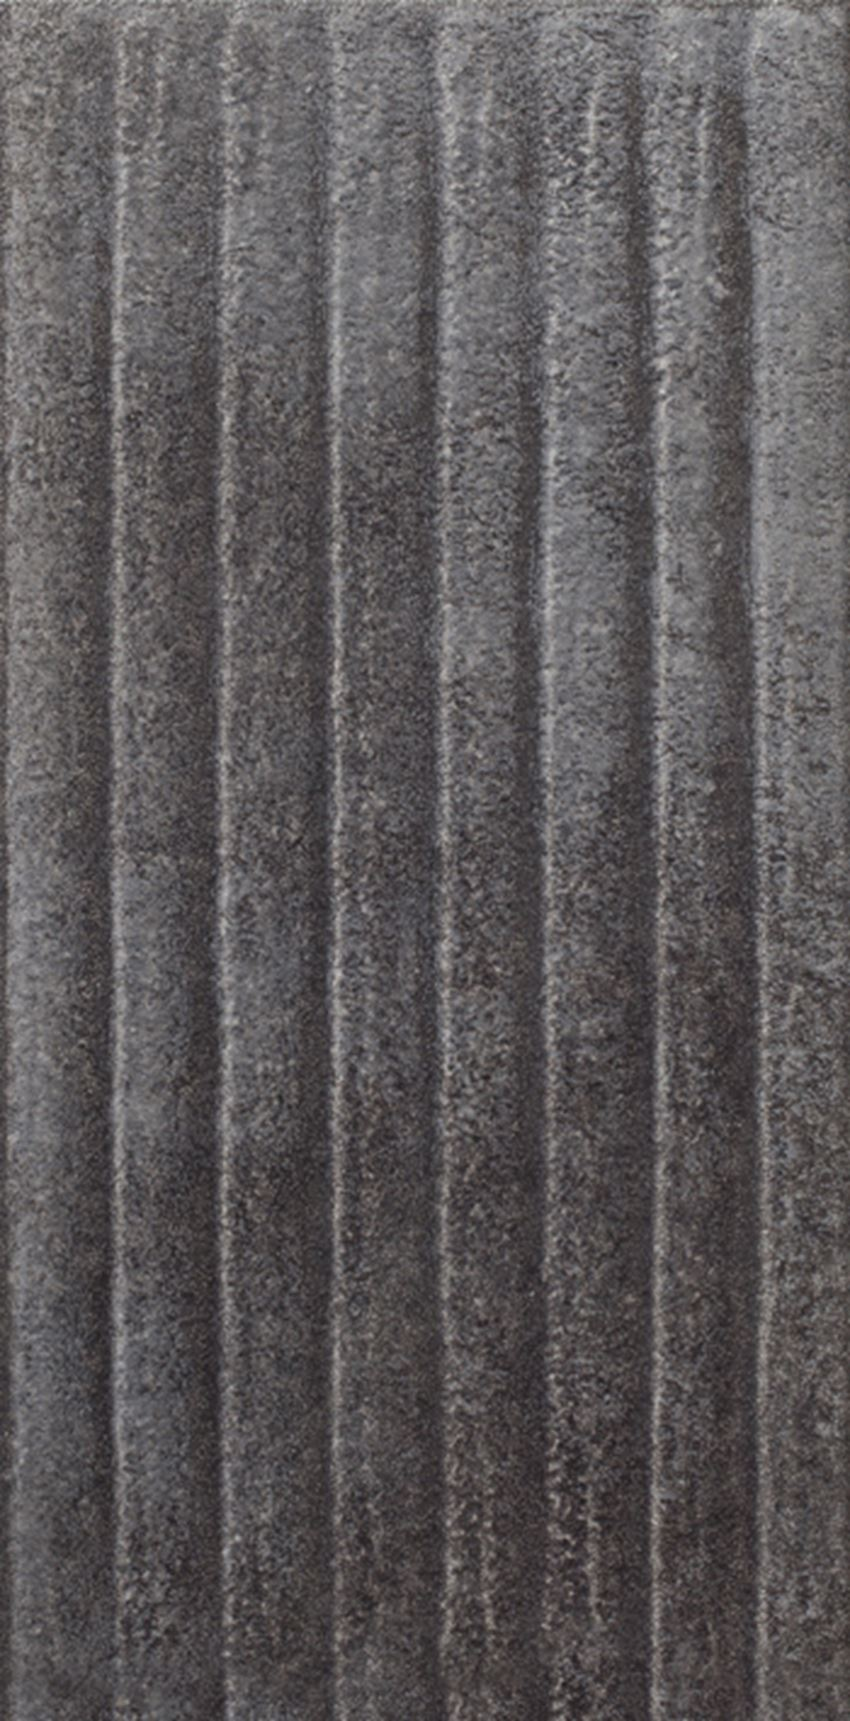 Podstopnica 14,8x30 cm Paradyż Bazalto Grafit C Podstopnica Struktura Głęboka